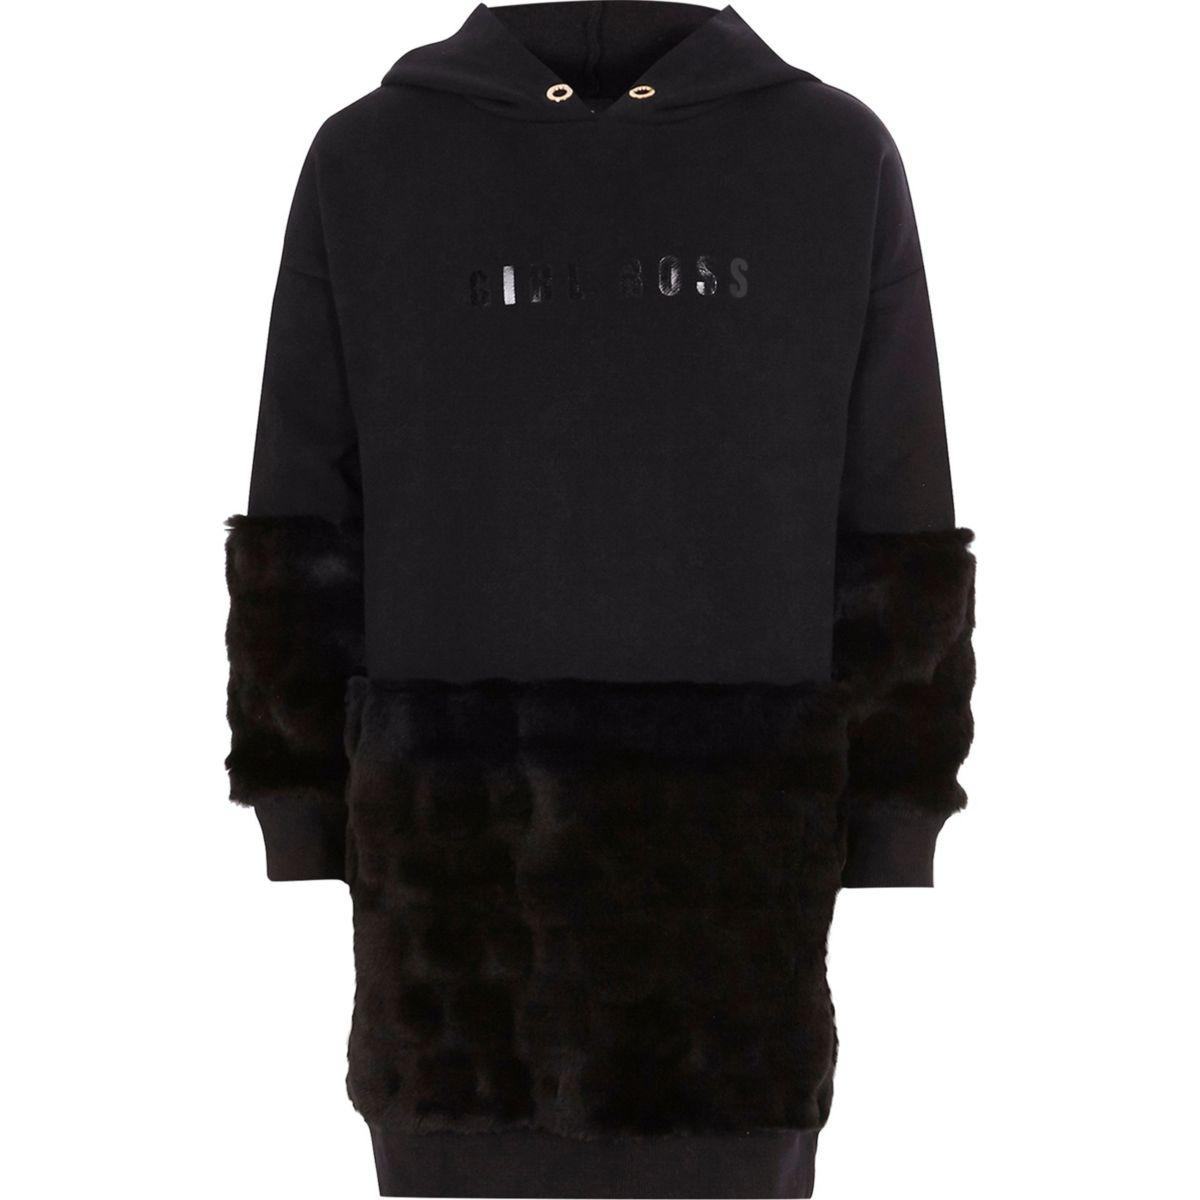 Girls black 'girl boss' faux fur sweater dress